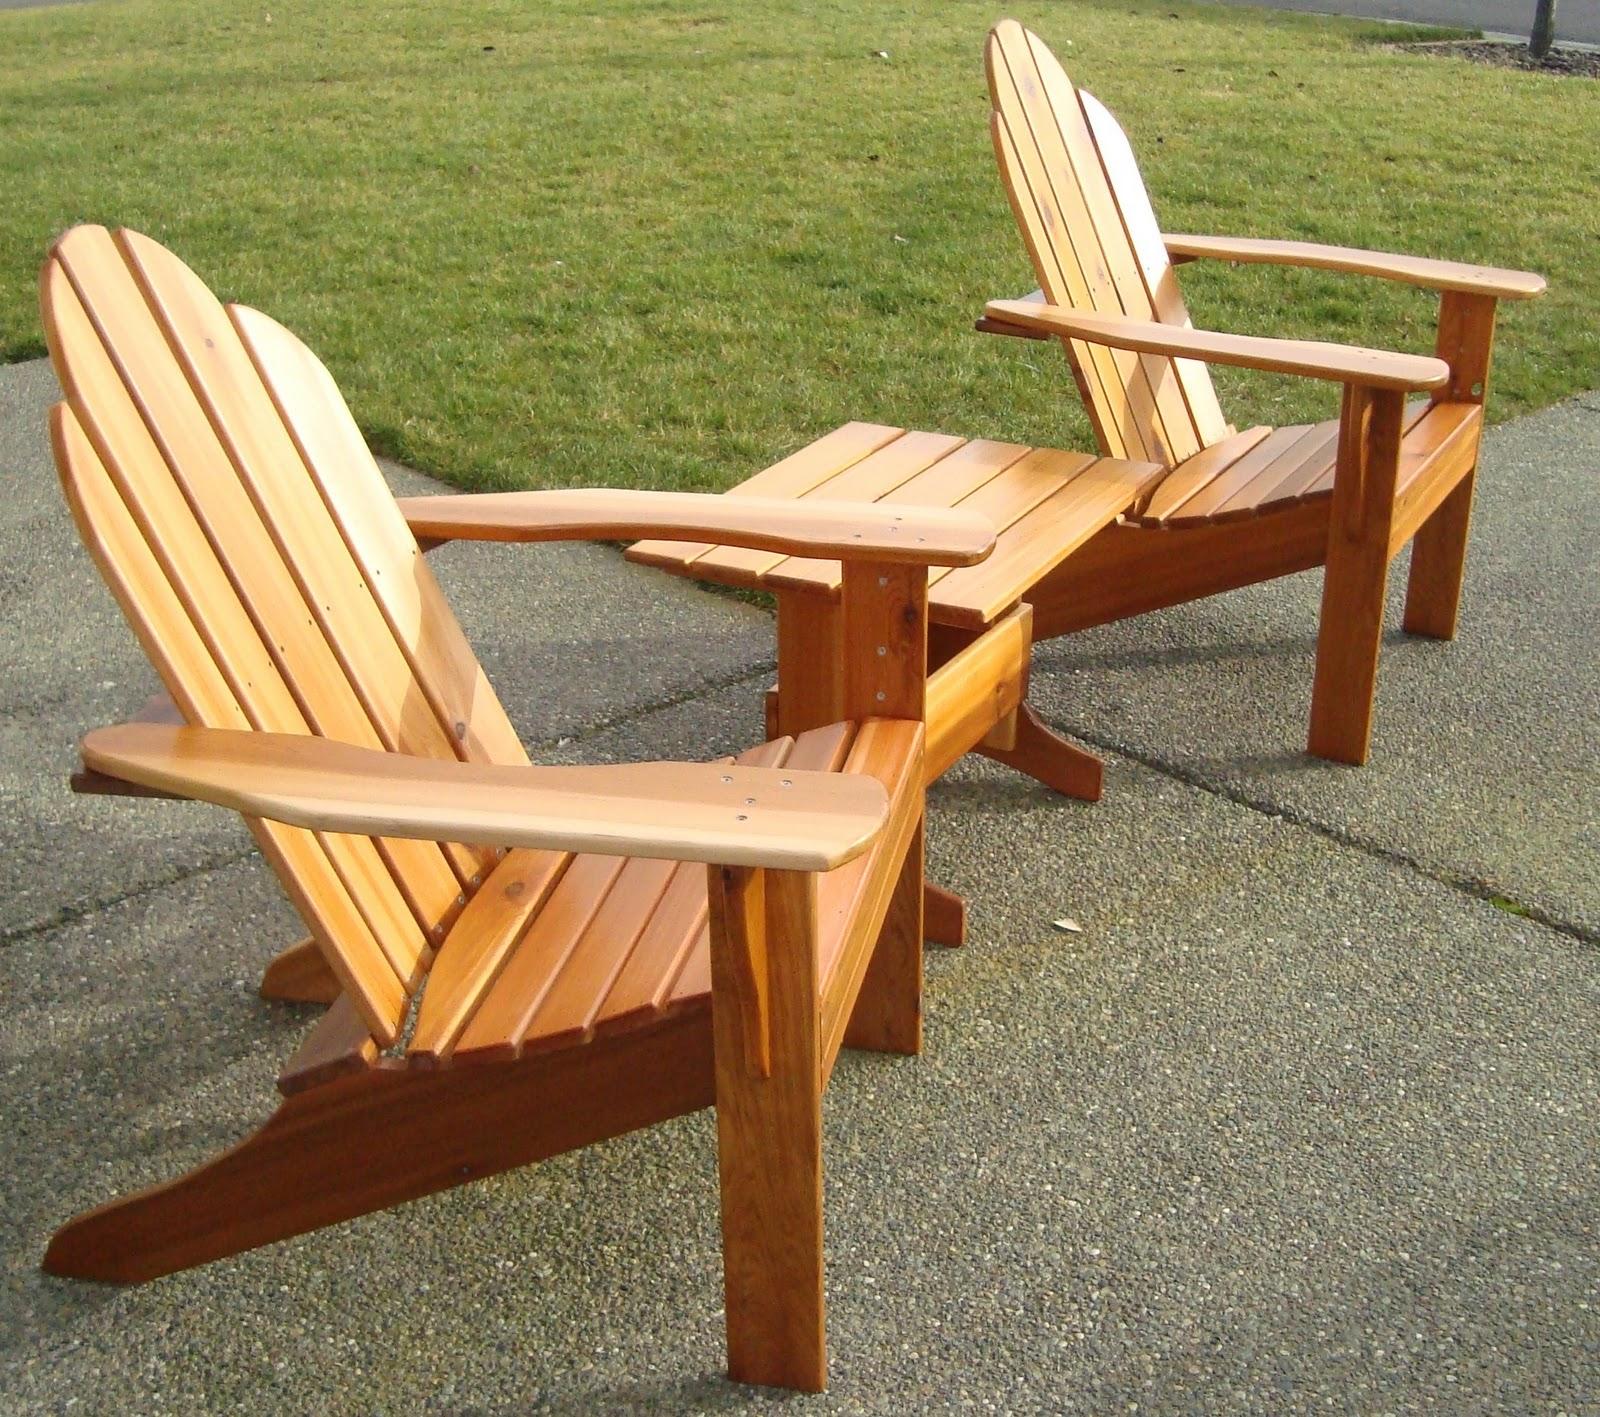 Pacnw Righty Adirondack Chairs